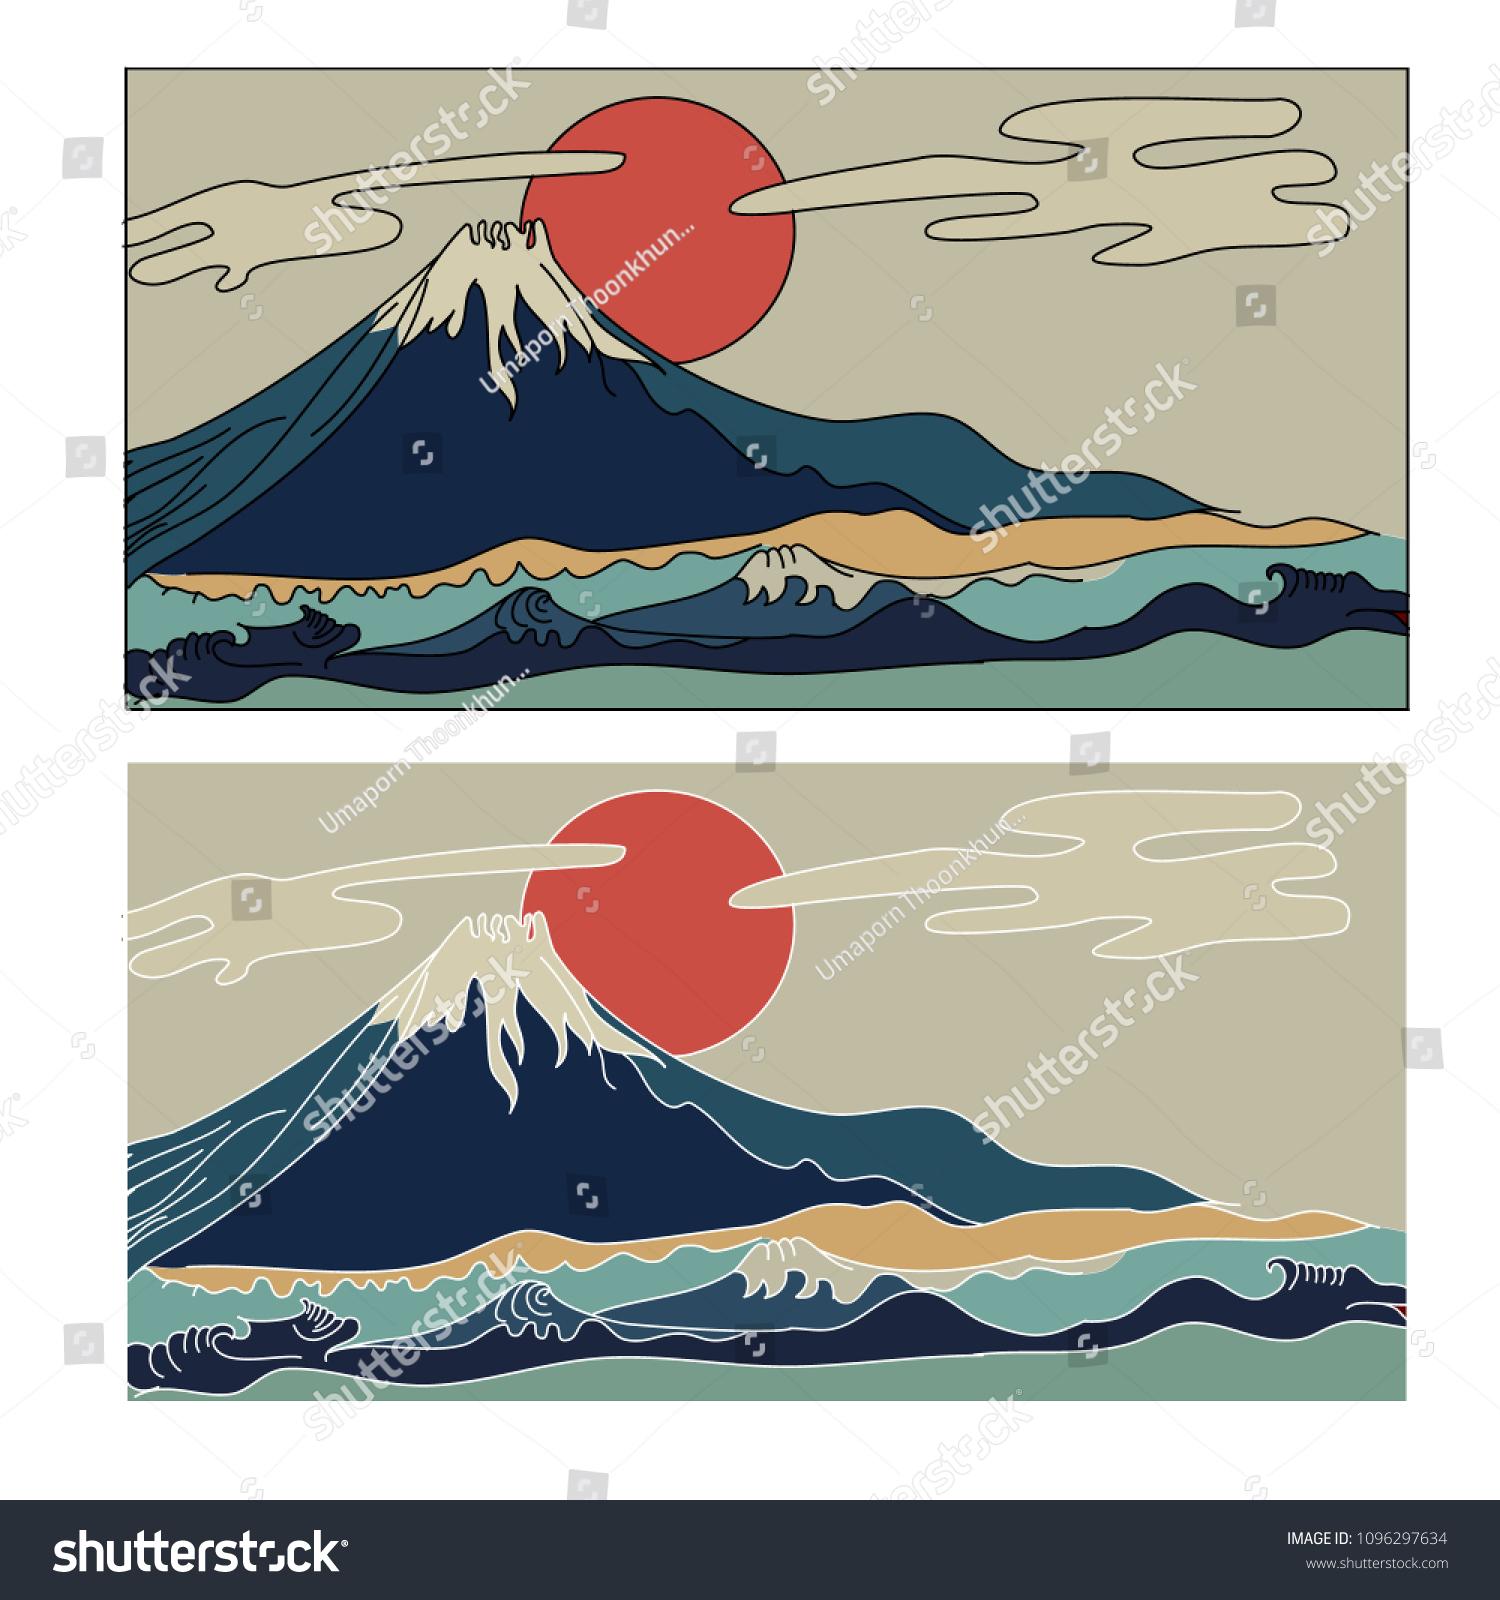 Fuji Mountain Vectorjapanese Mountain Wallpaper Red Stock Vector Royalty Free 1096297634